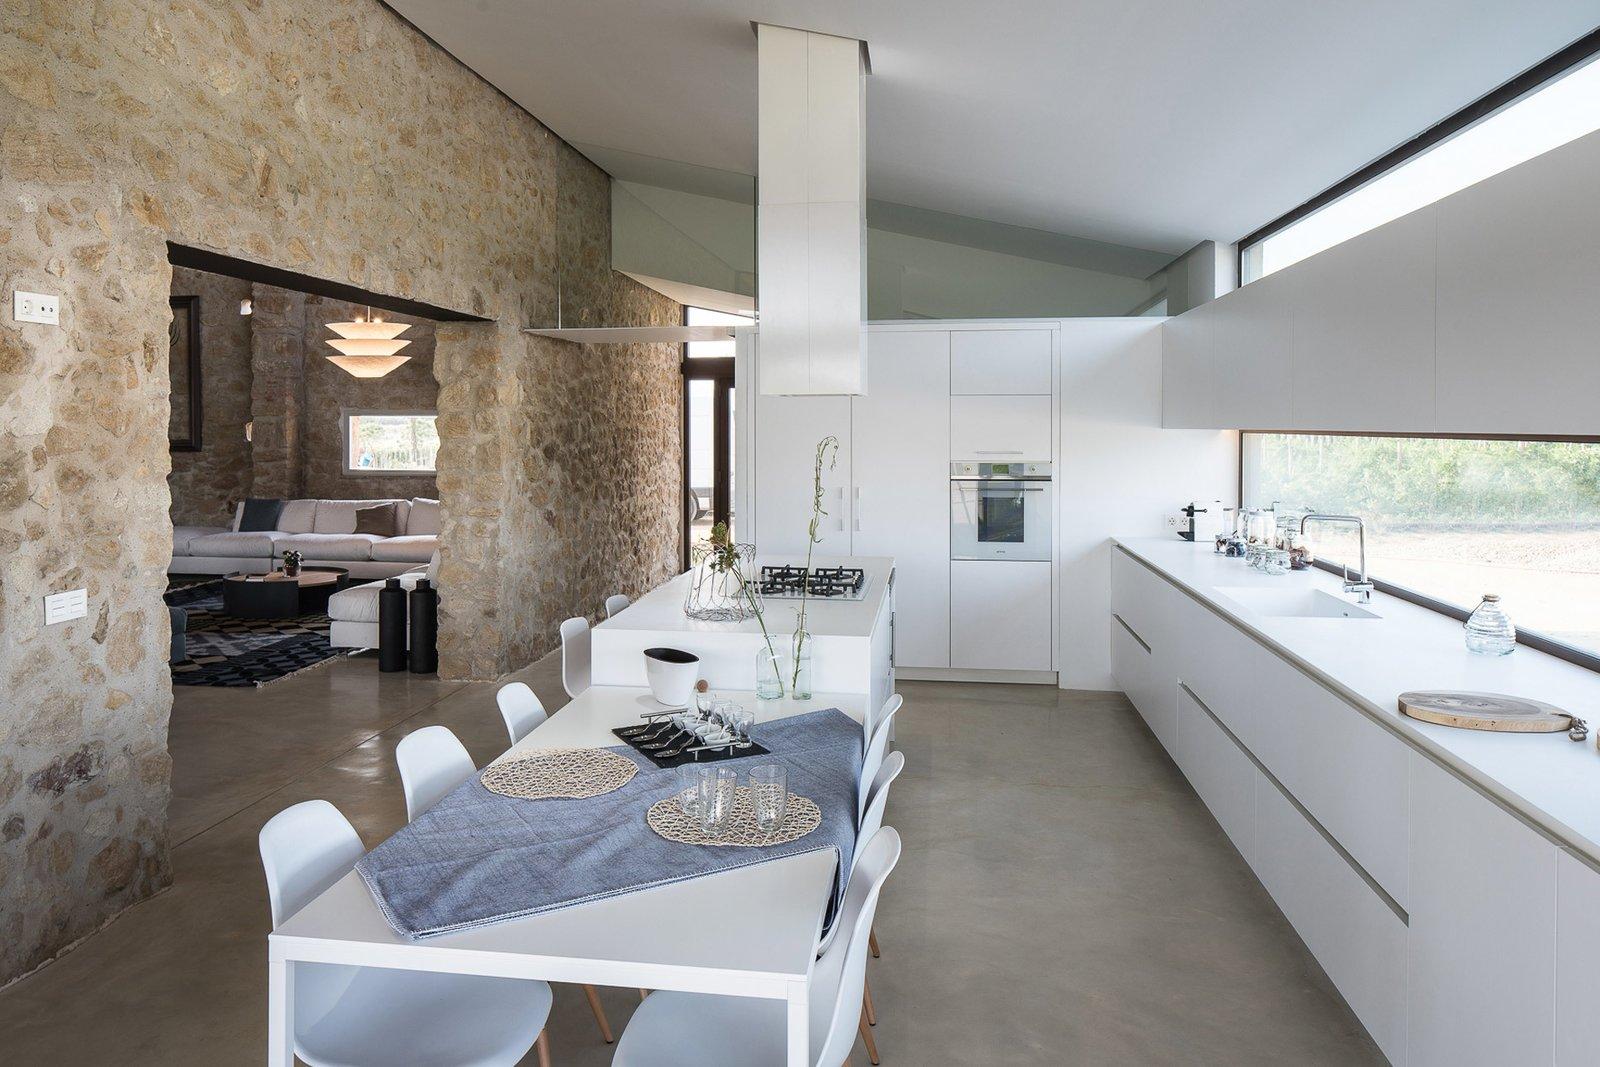 modern farmhouse kitchen with stone brick walls